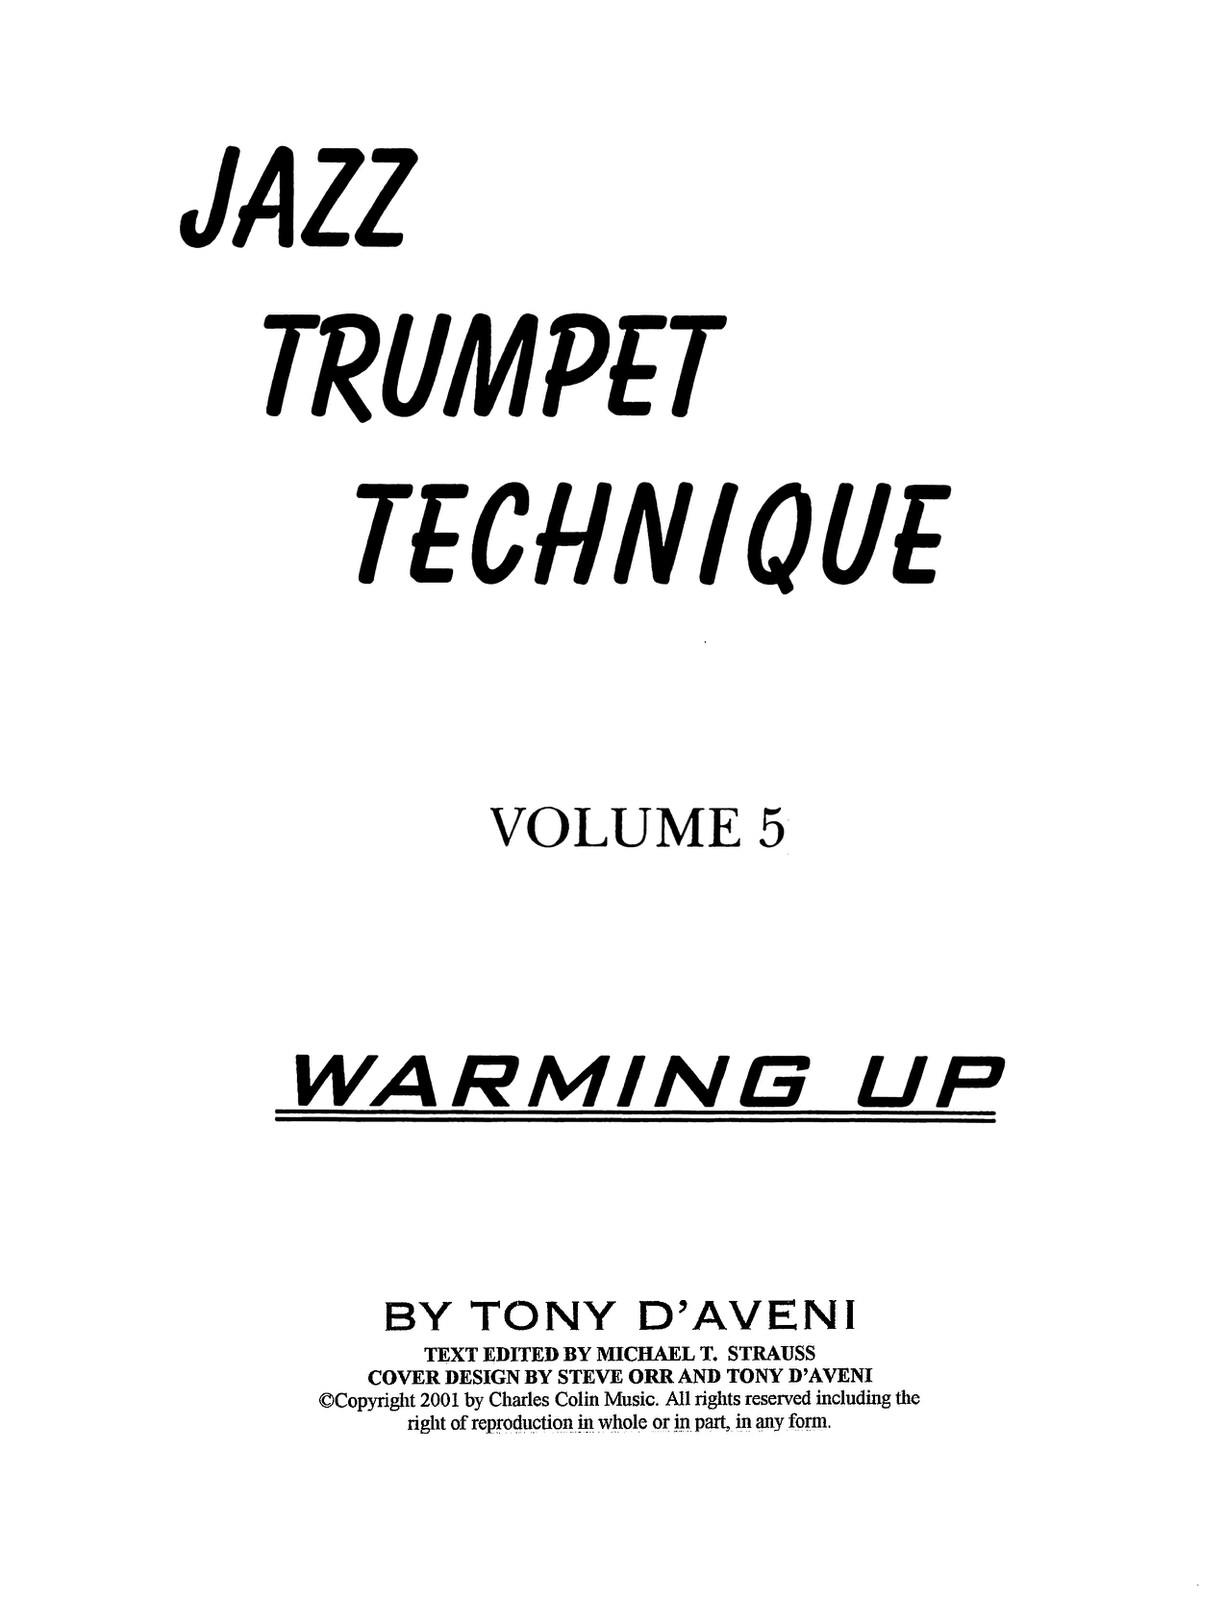 Jazz Trumpet Technique Vol 5 Warming Up